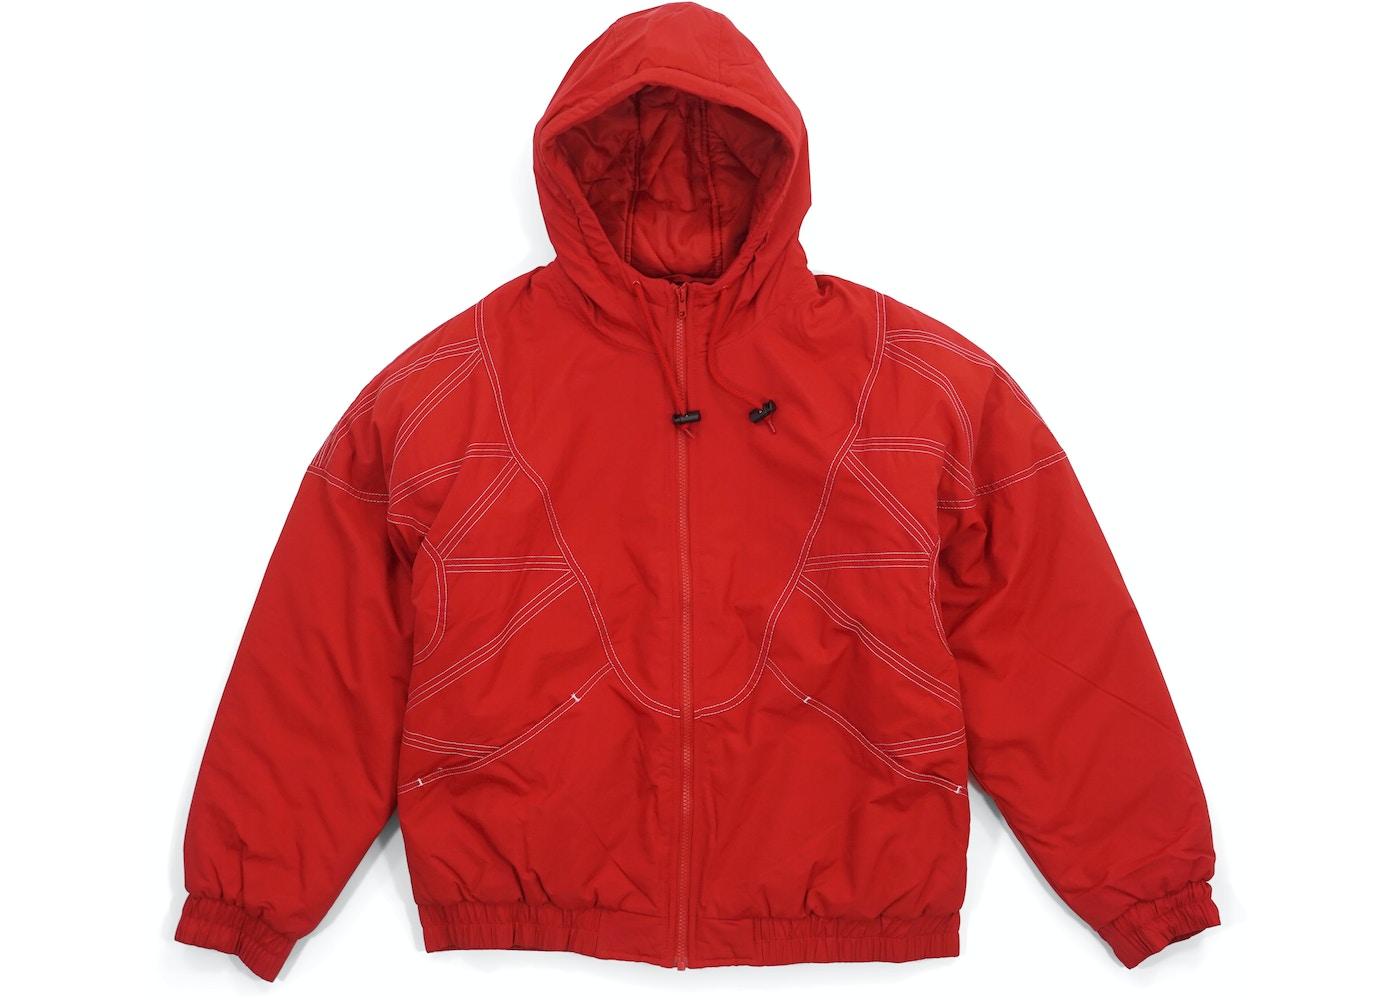 f5a51eb2 Supreme Zig Zag Stitch Puffy Jacket Red - FW18